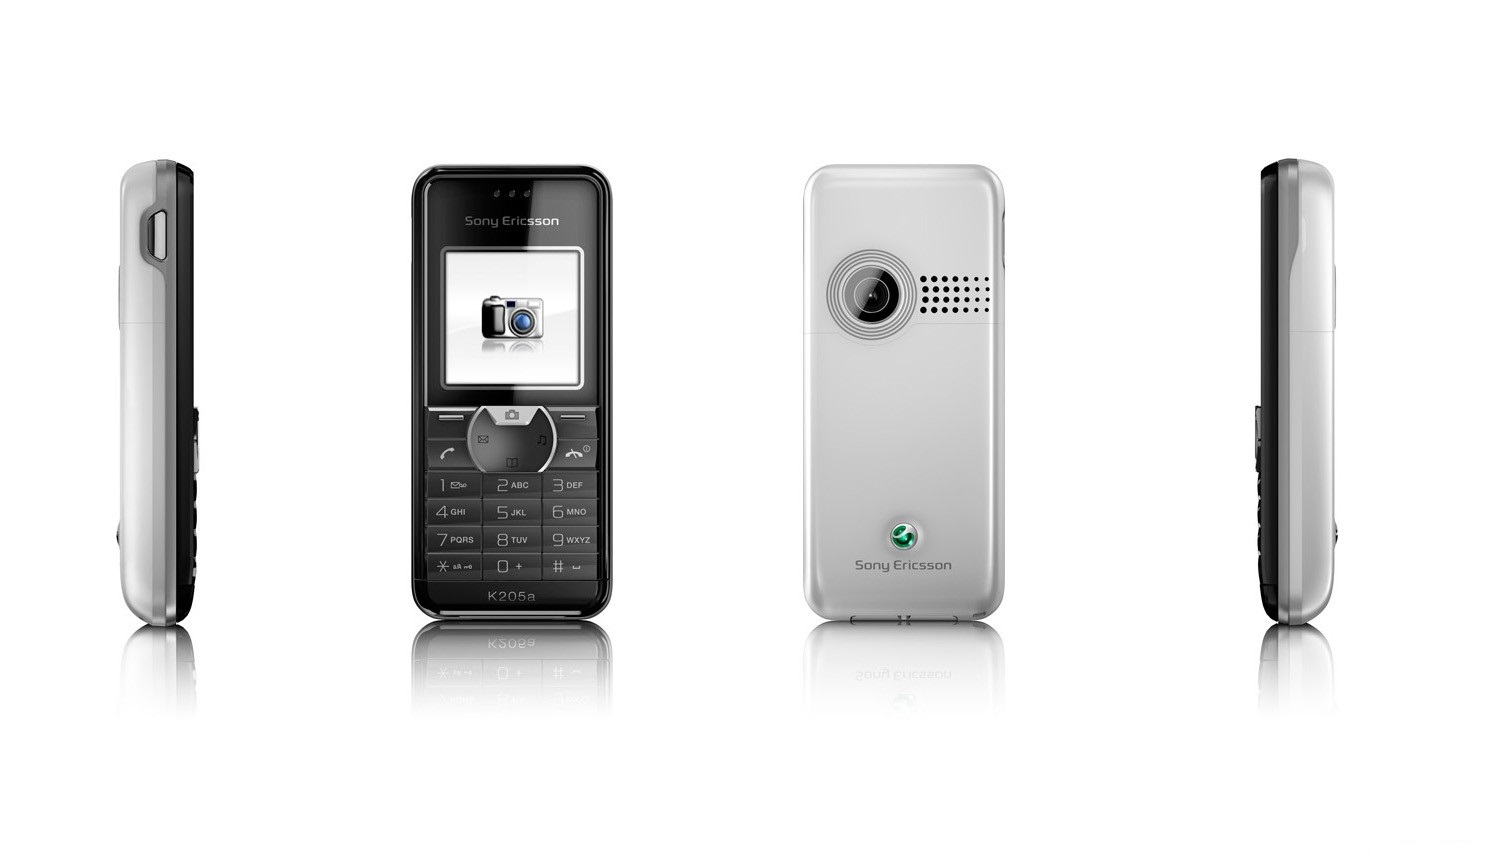 Sony Ericsson Xperia K205